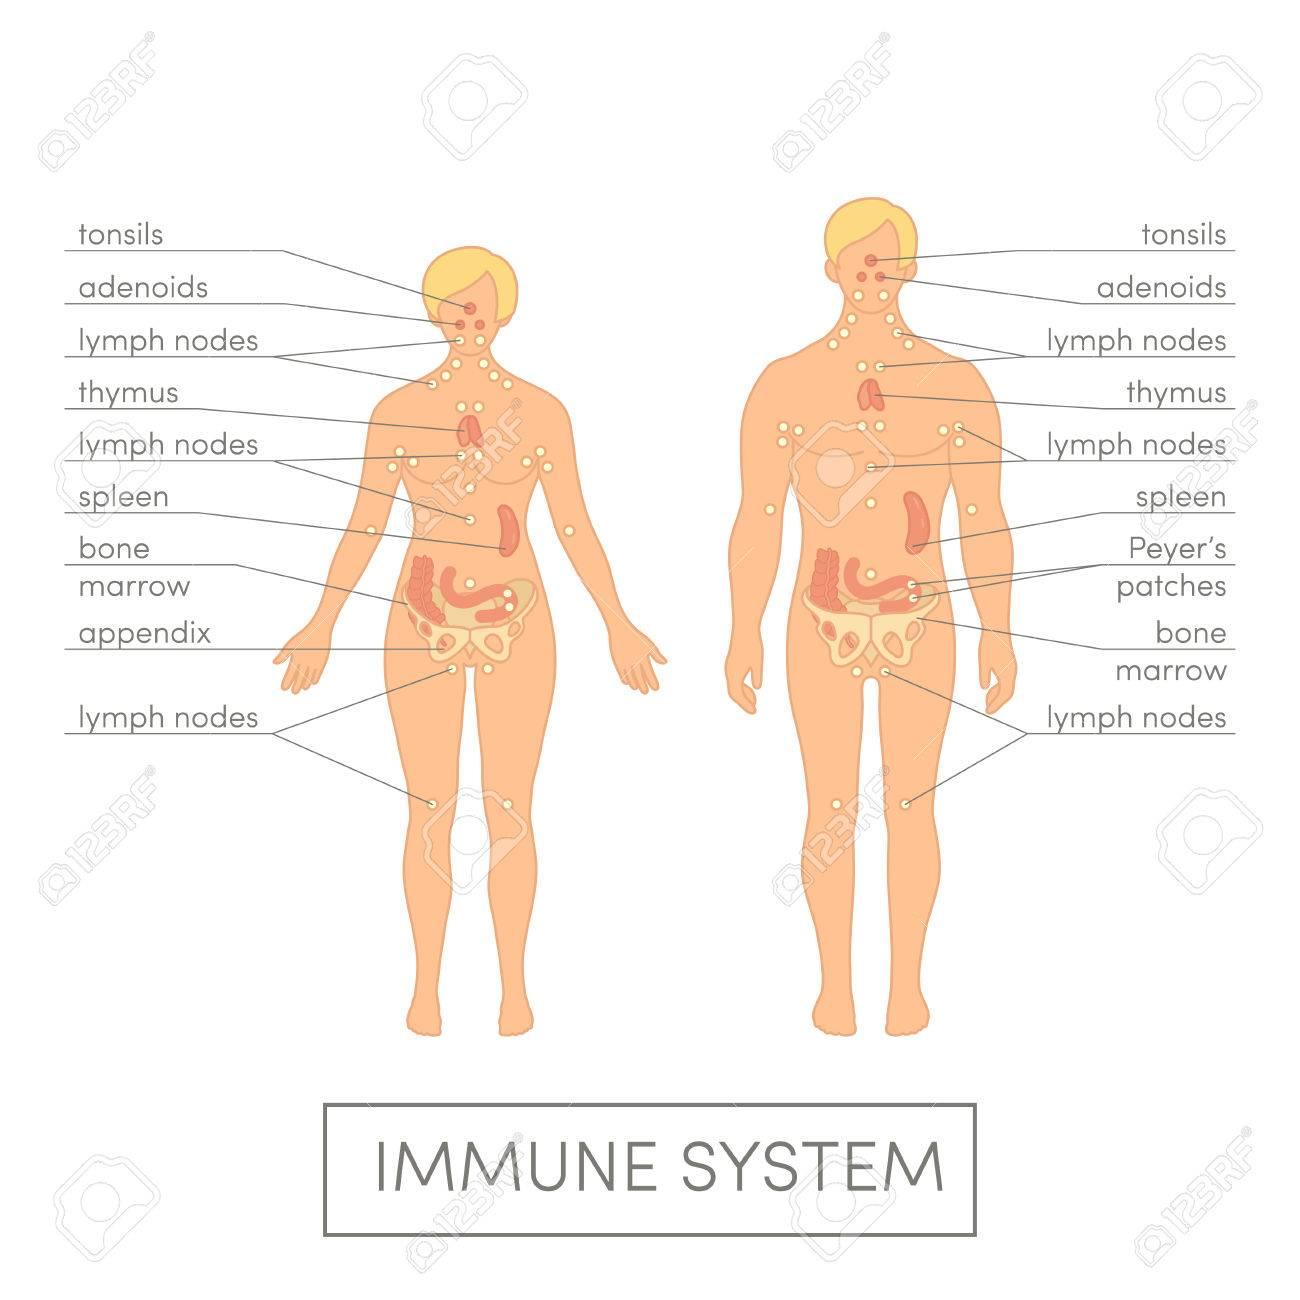 Immune System Of A Human. Cartoon Illustration For Medical Atlas ...